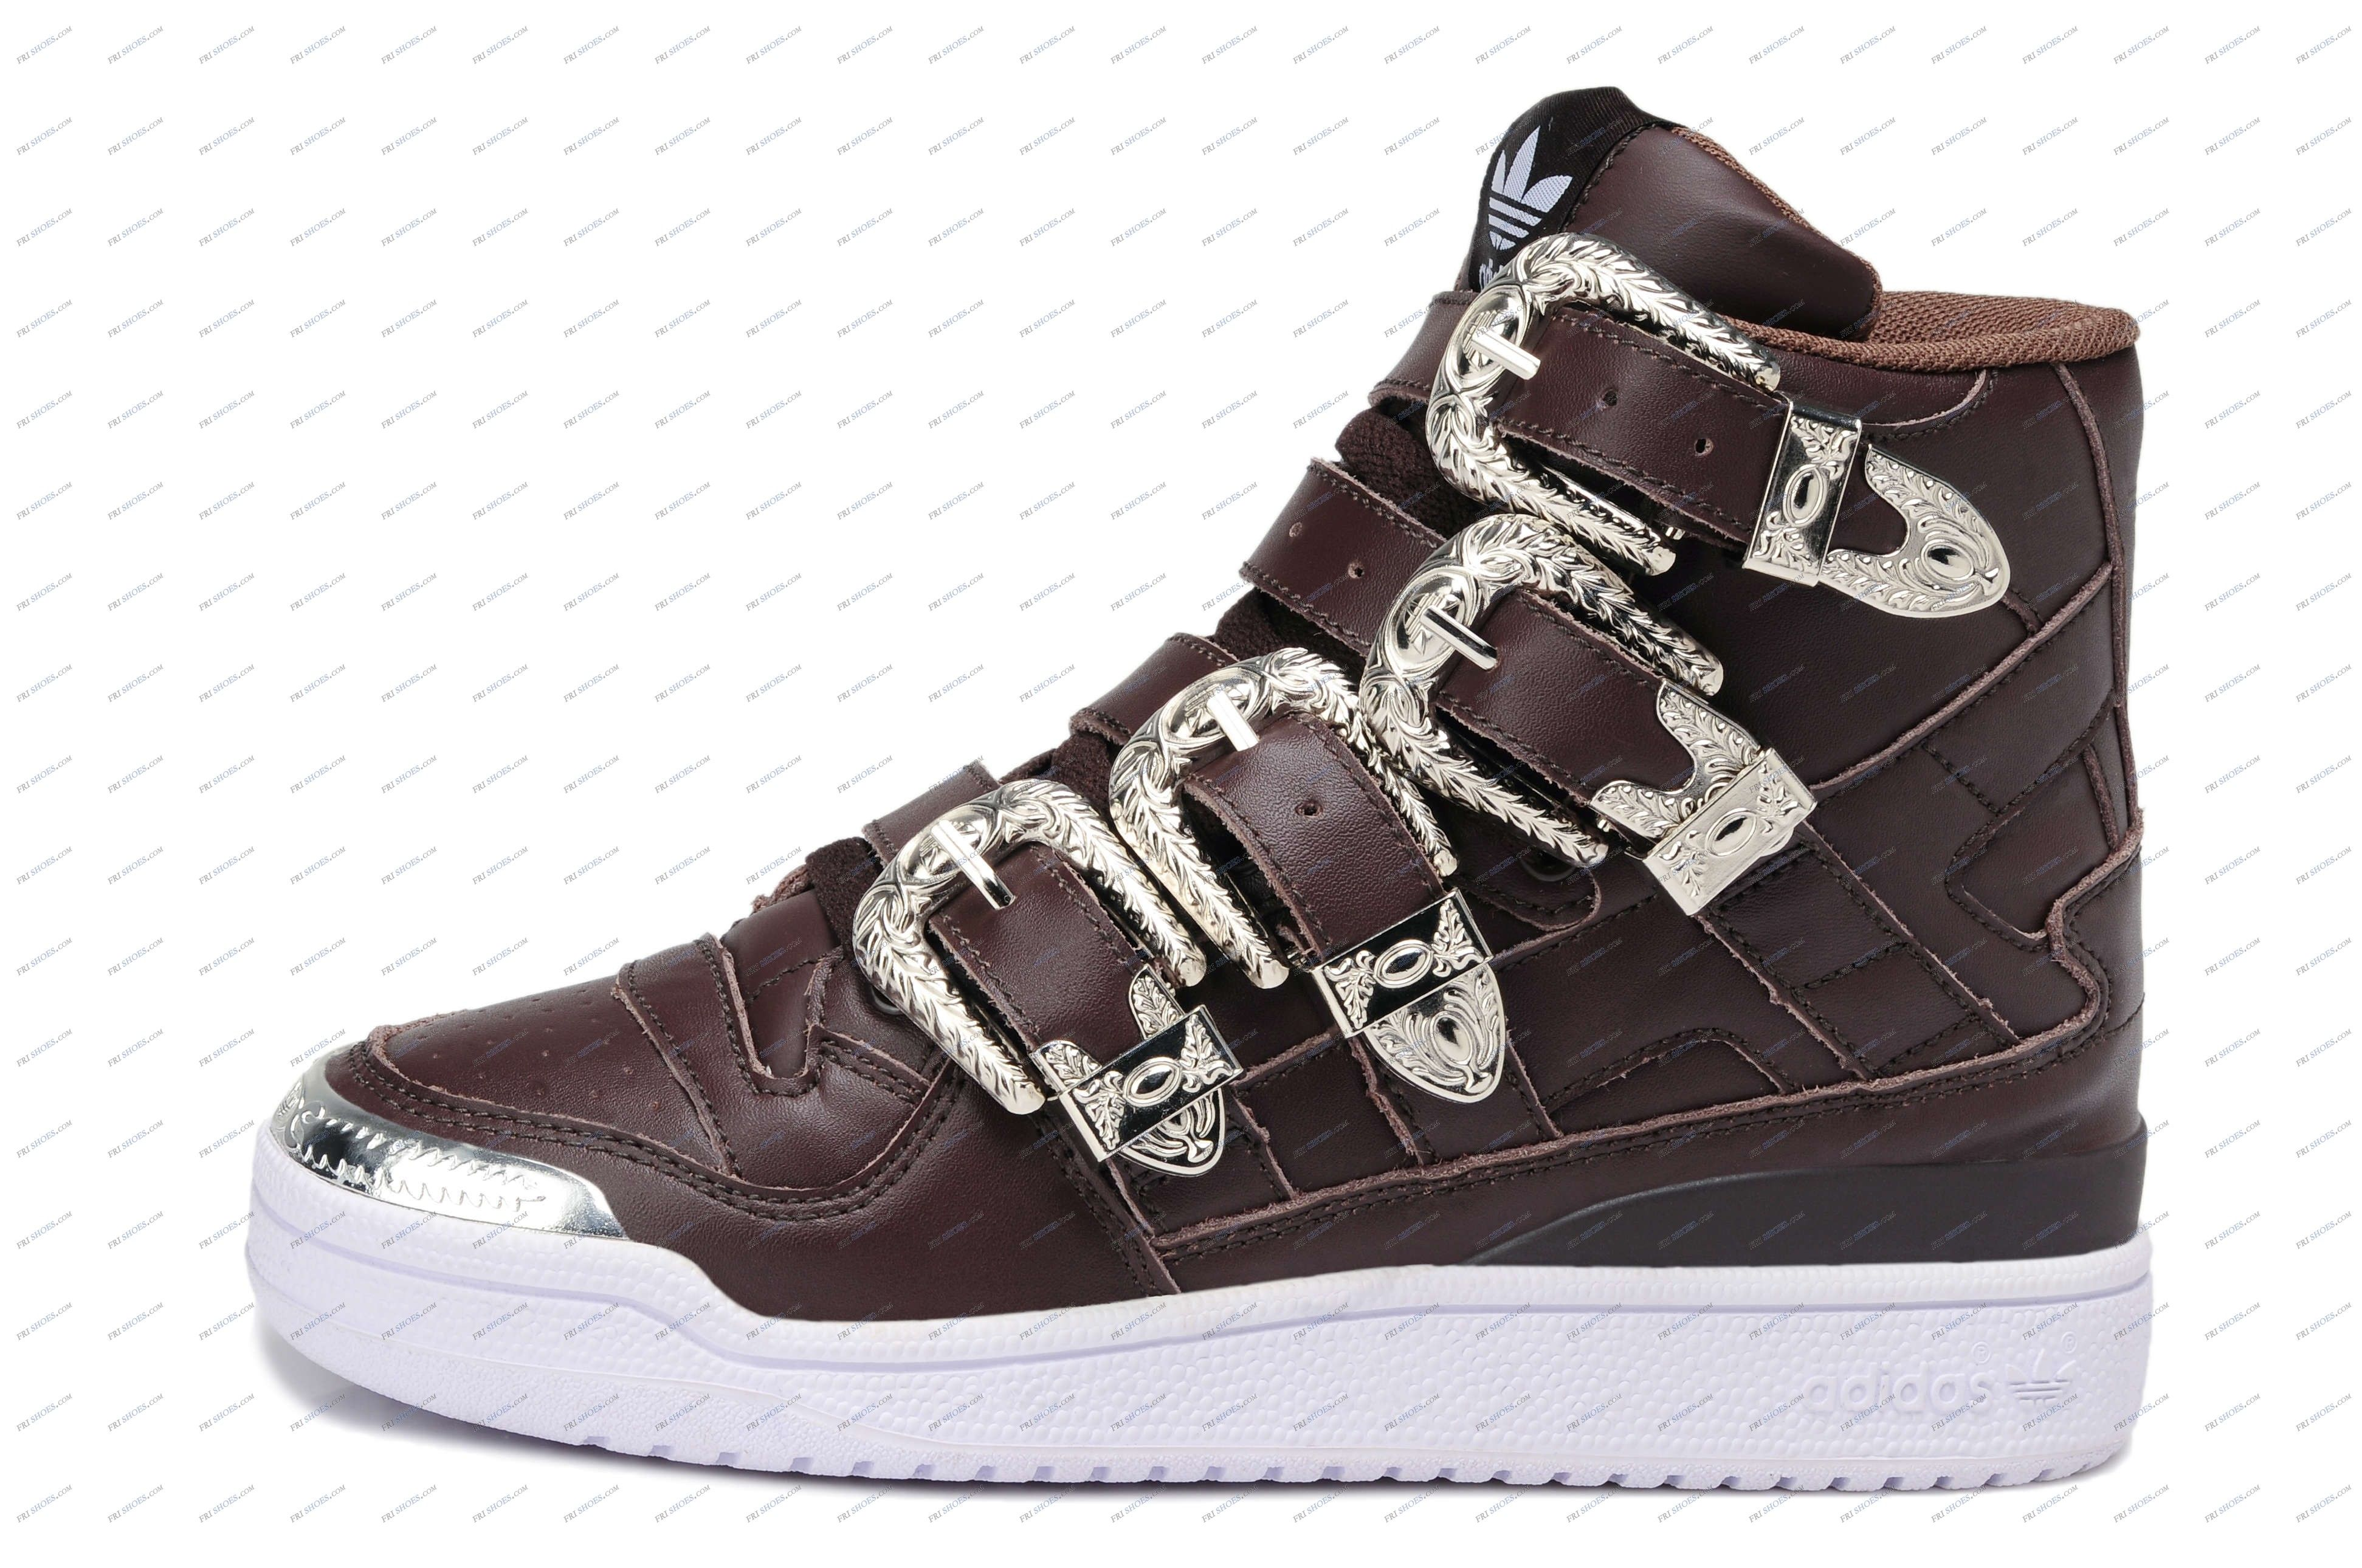 adidas jeremy scott shoes online